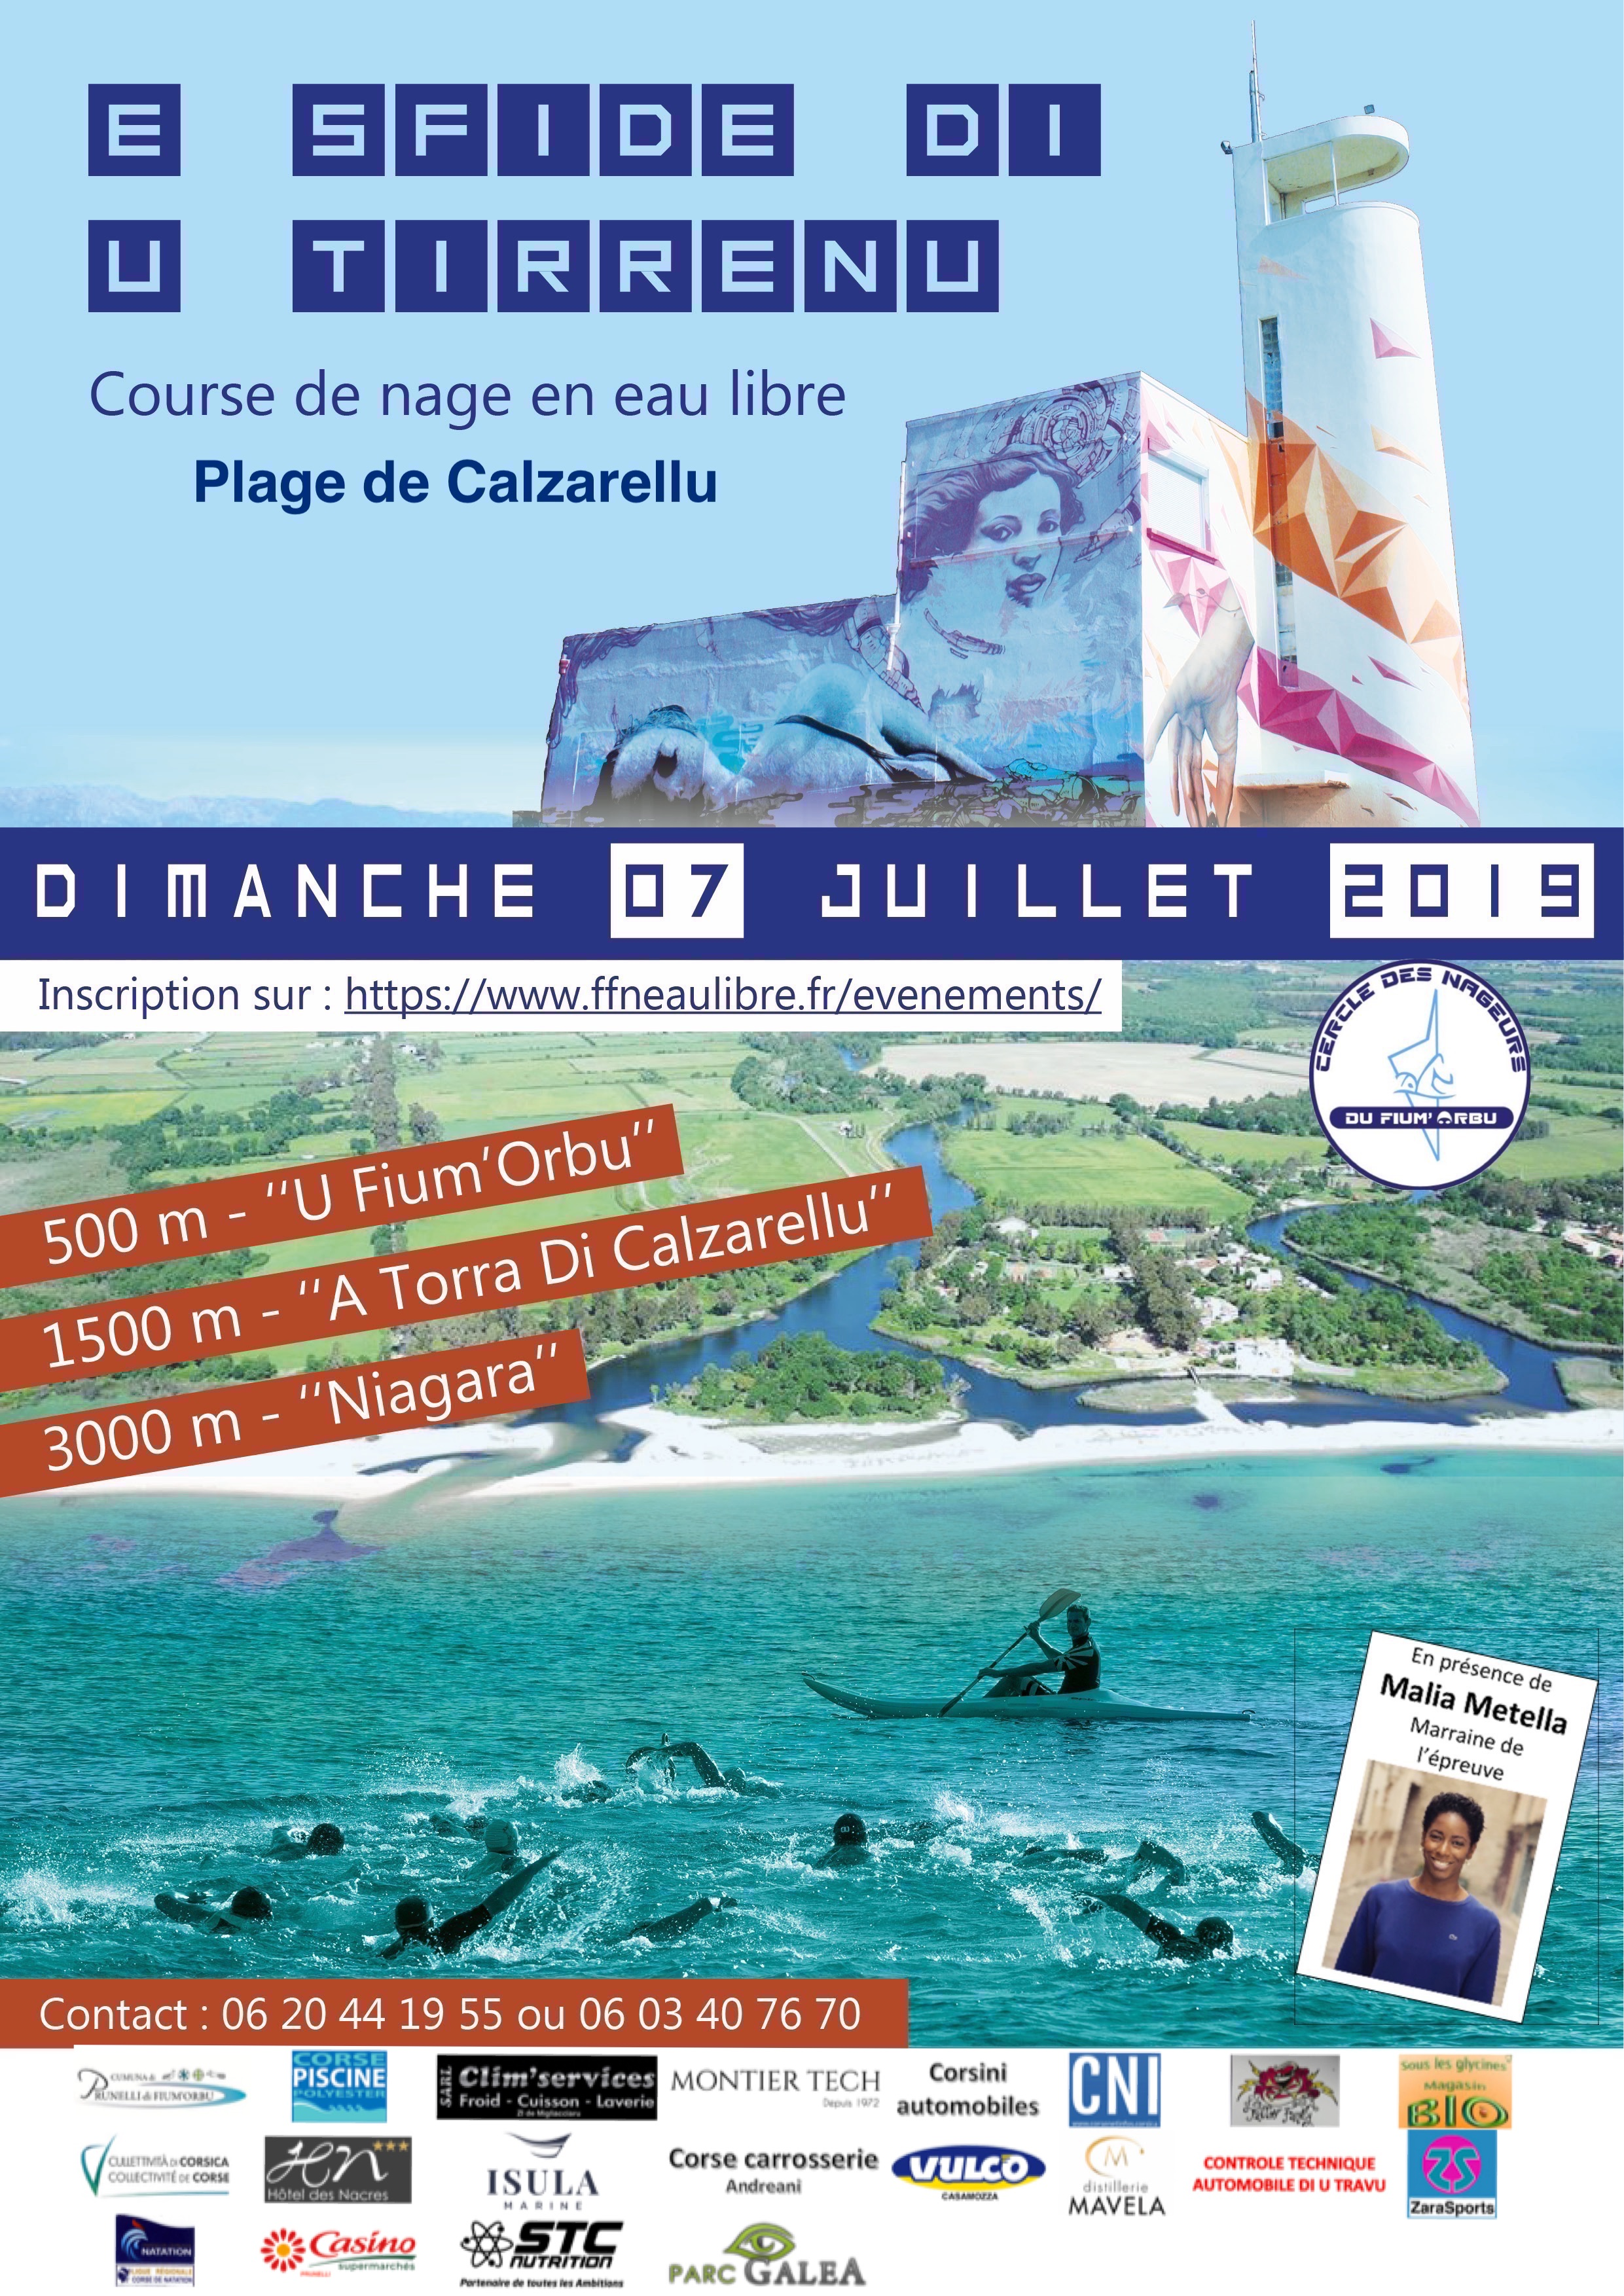 INEDIT : E sfide di u Tirrenu, la nage en eau libre se développe en Corse